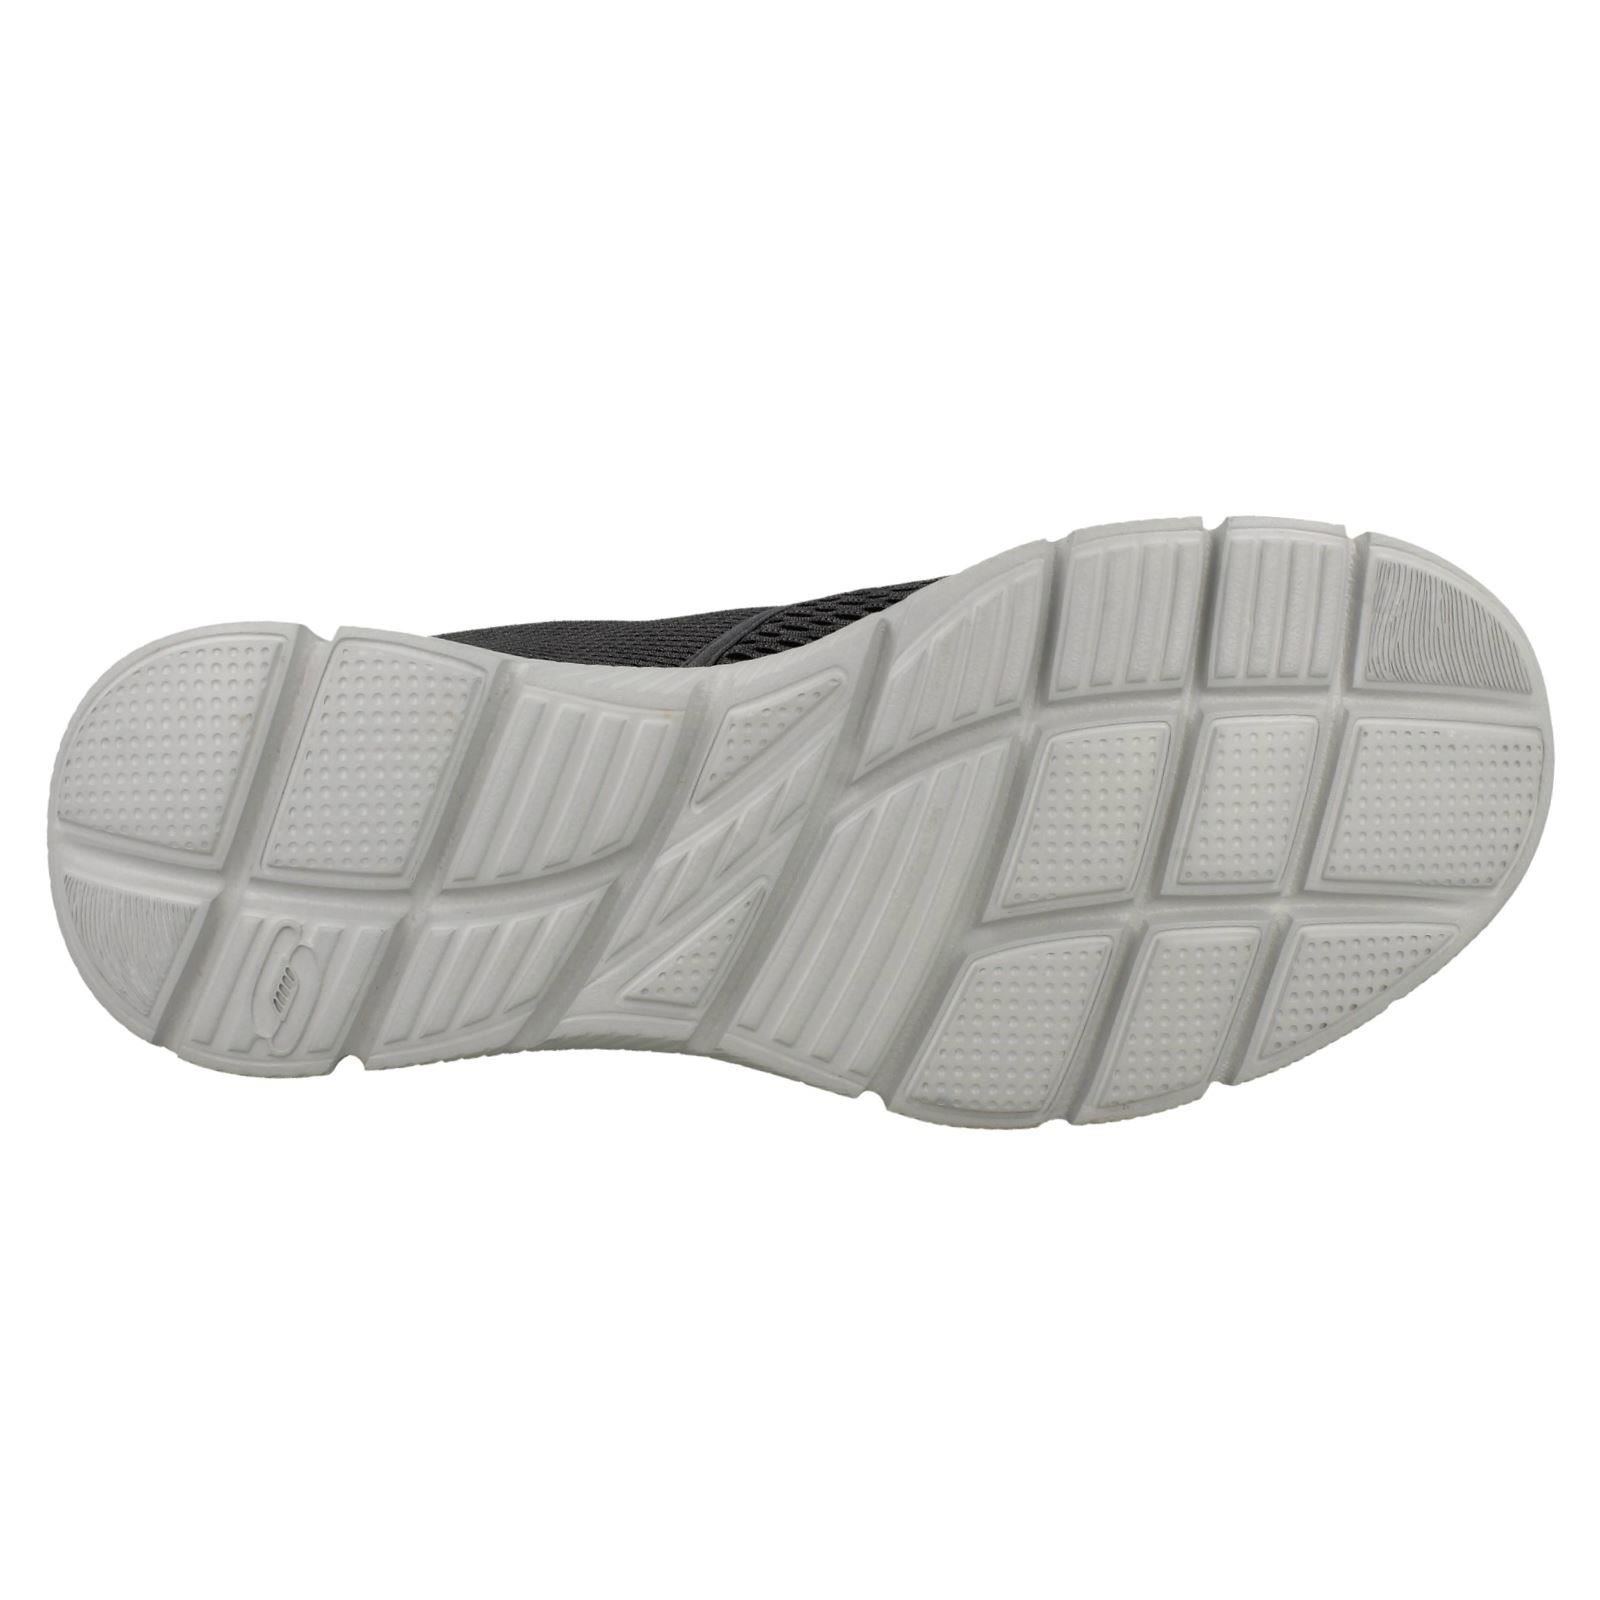 Homme Skechers Chaussures Memory Foam Enfiler Chaussures Skechers De Marche Double Play 15db1d